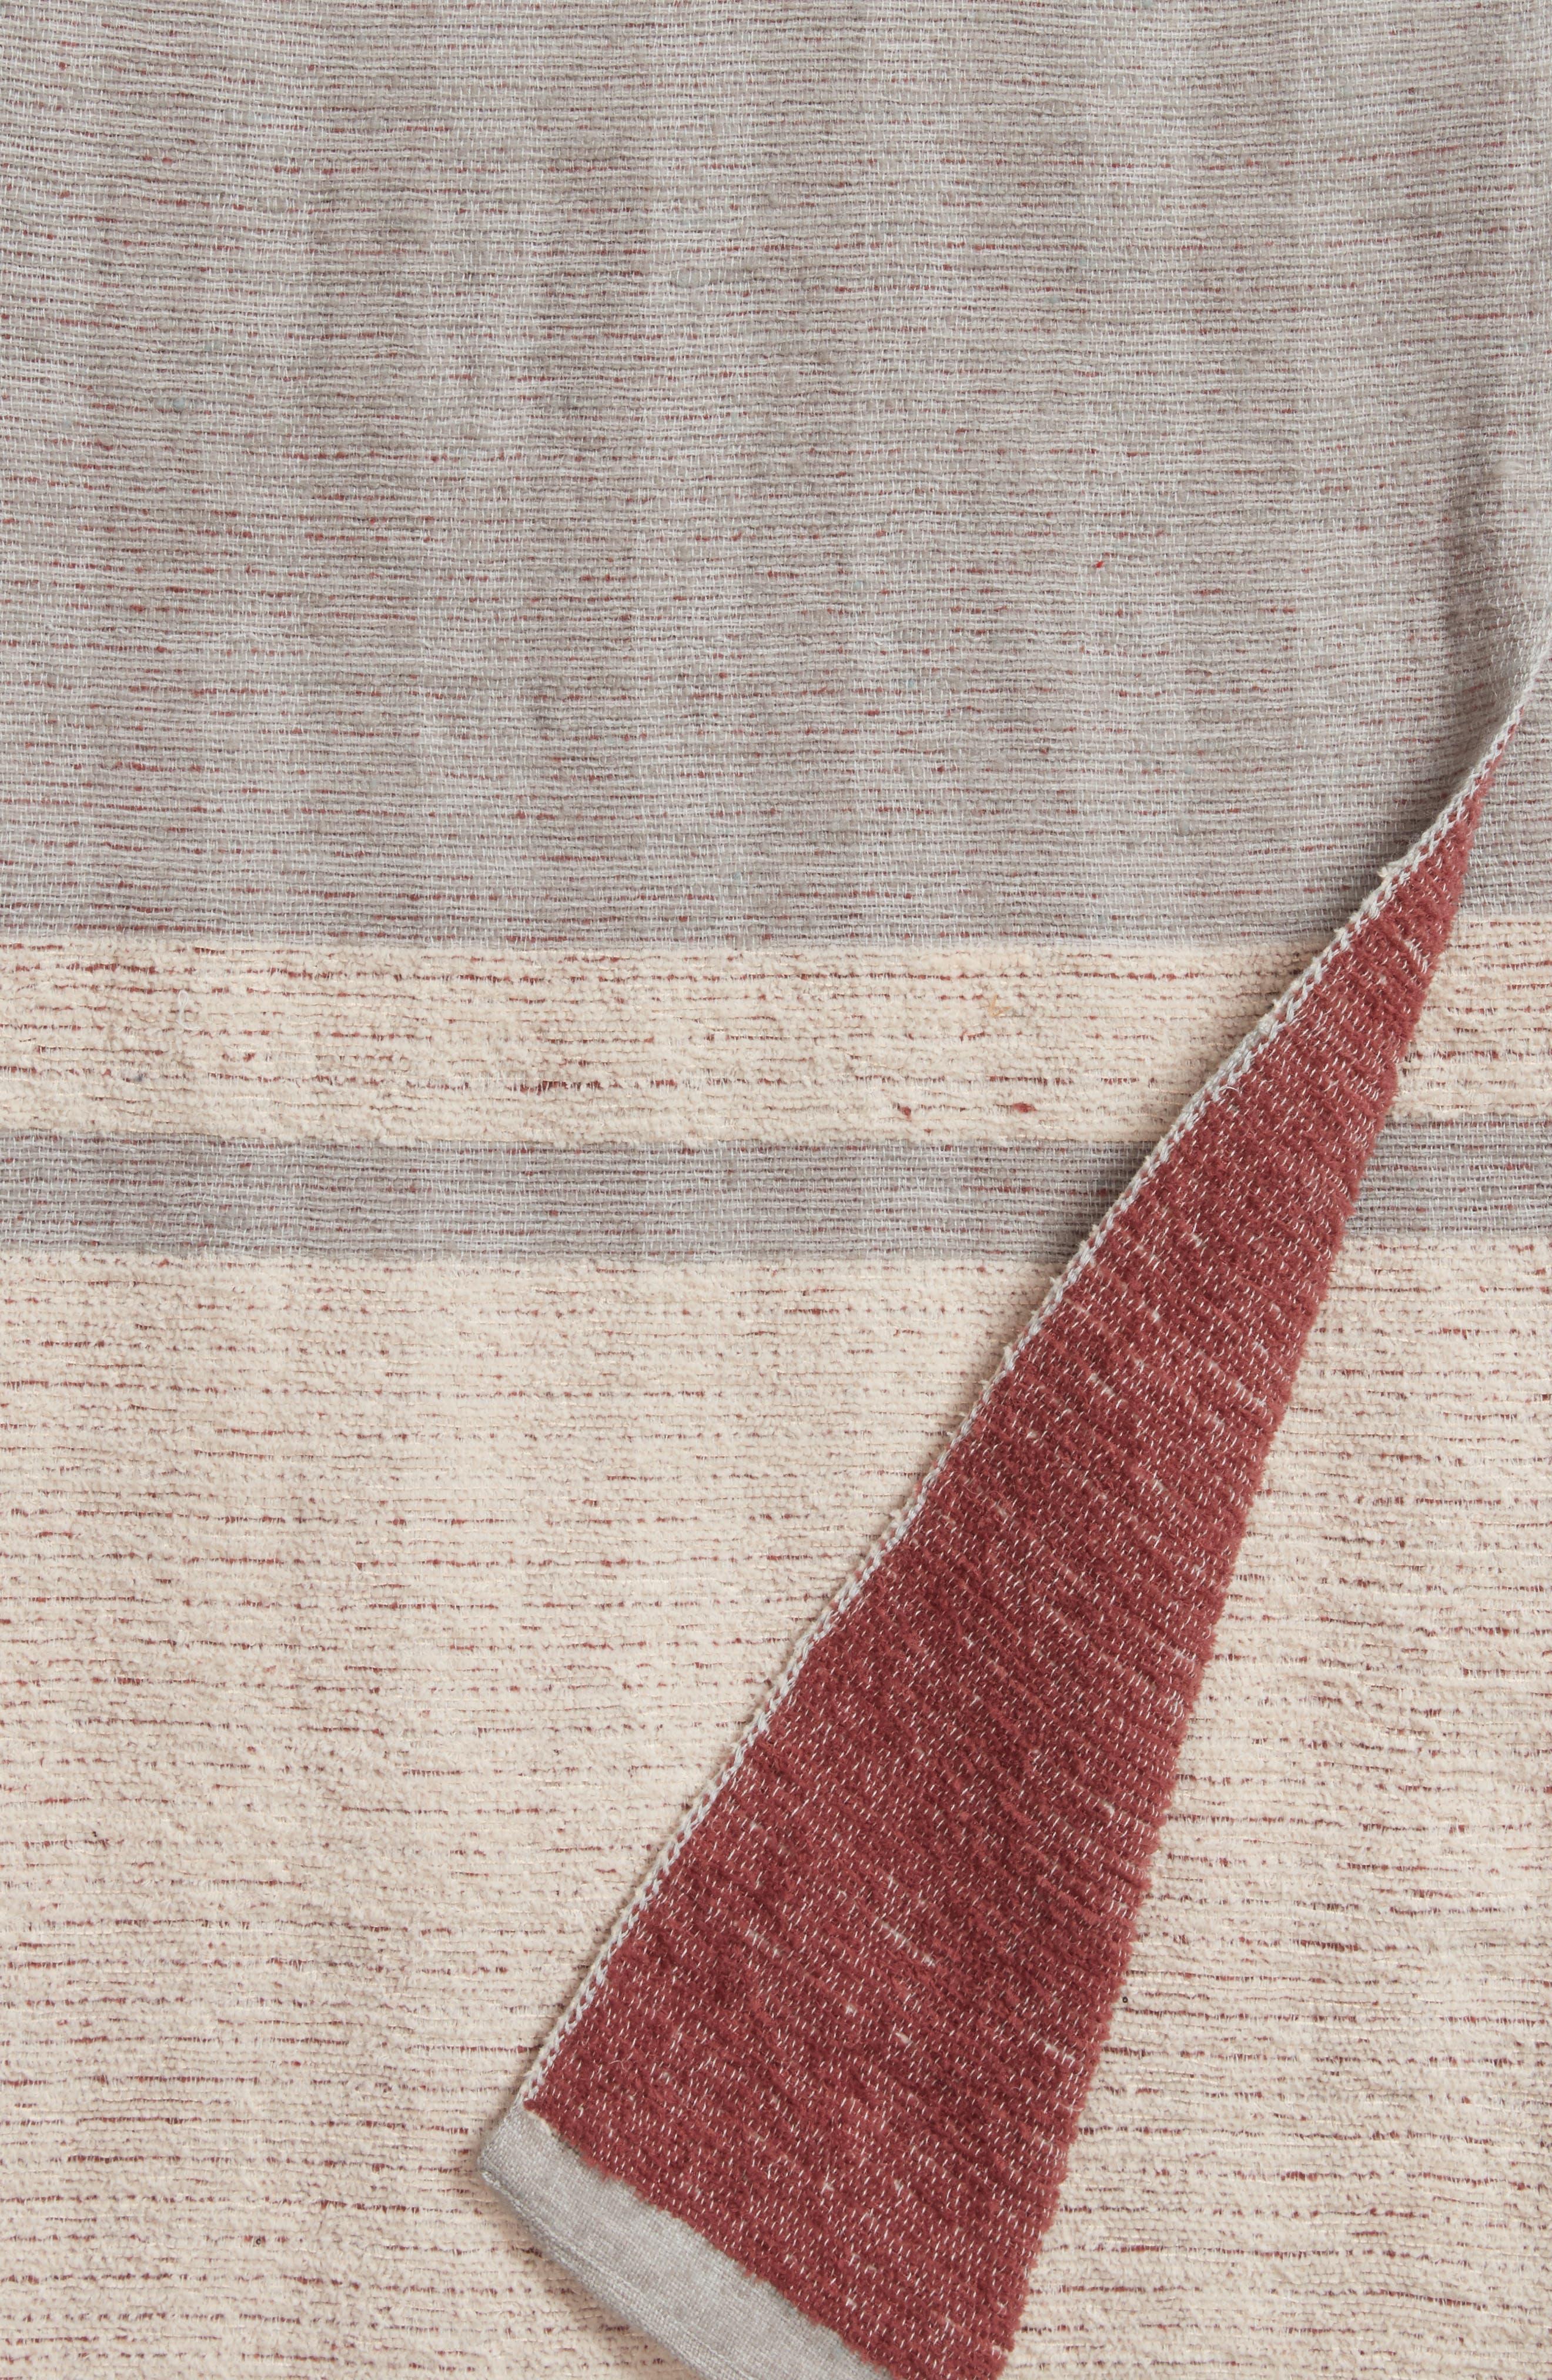 Reversible Stripe Throw,                             Alternate thumbnail 2, color,                             020